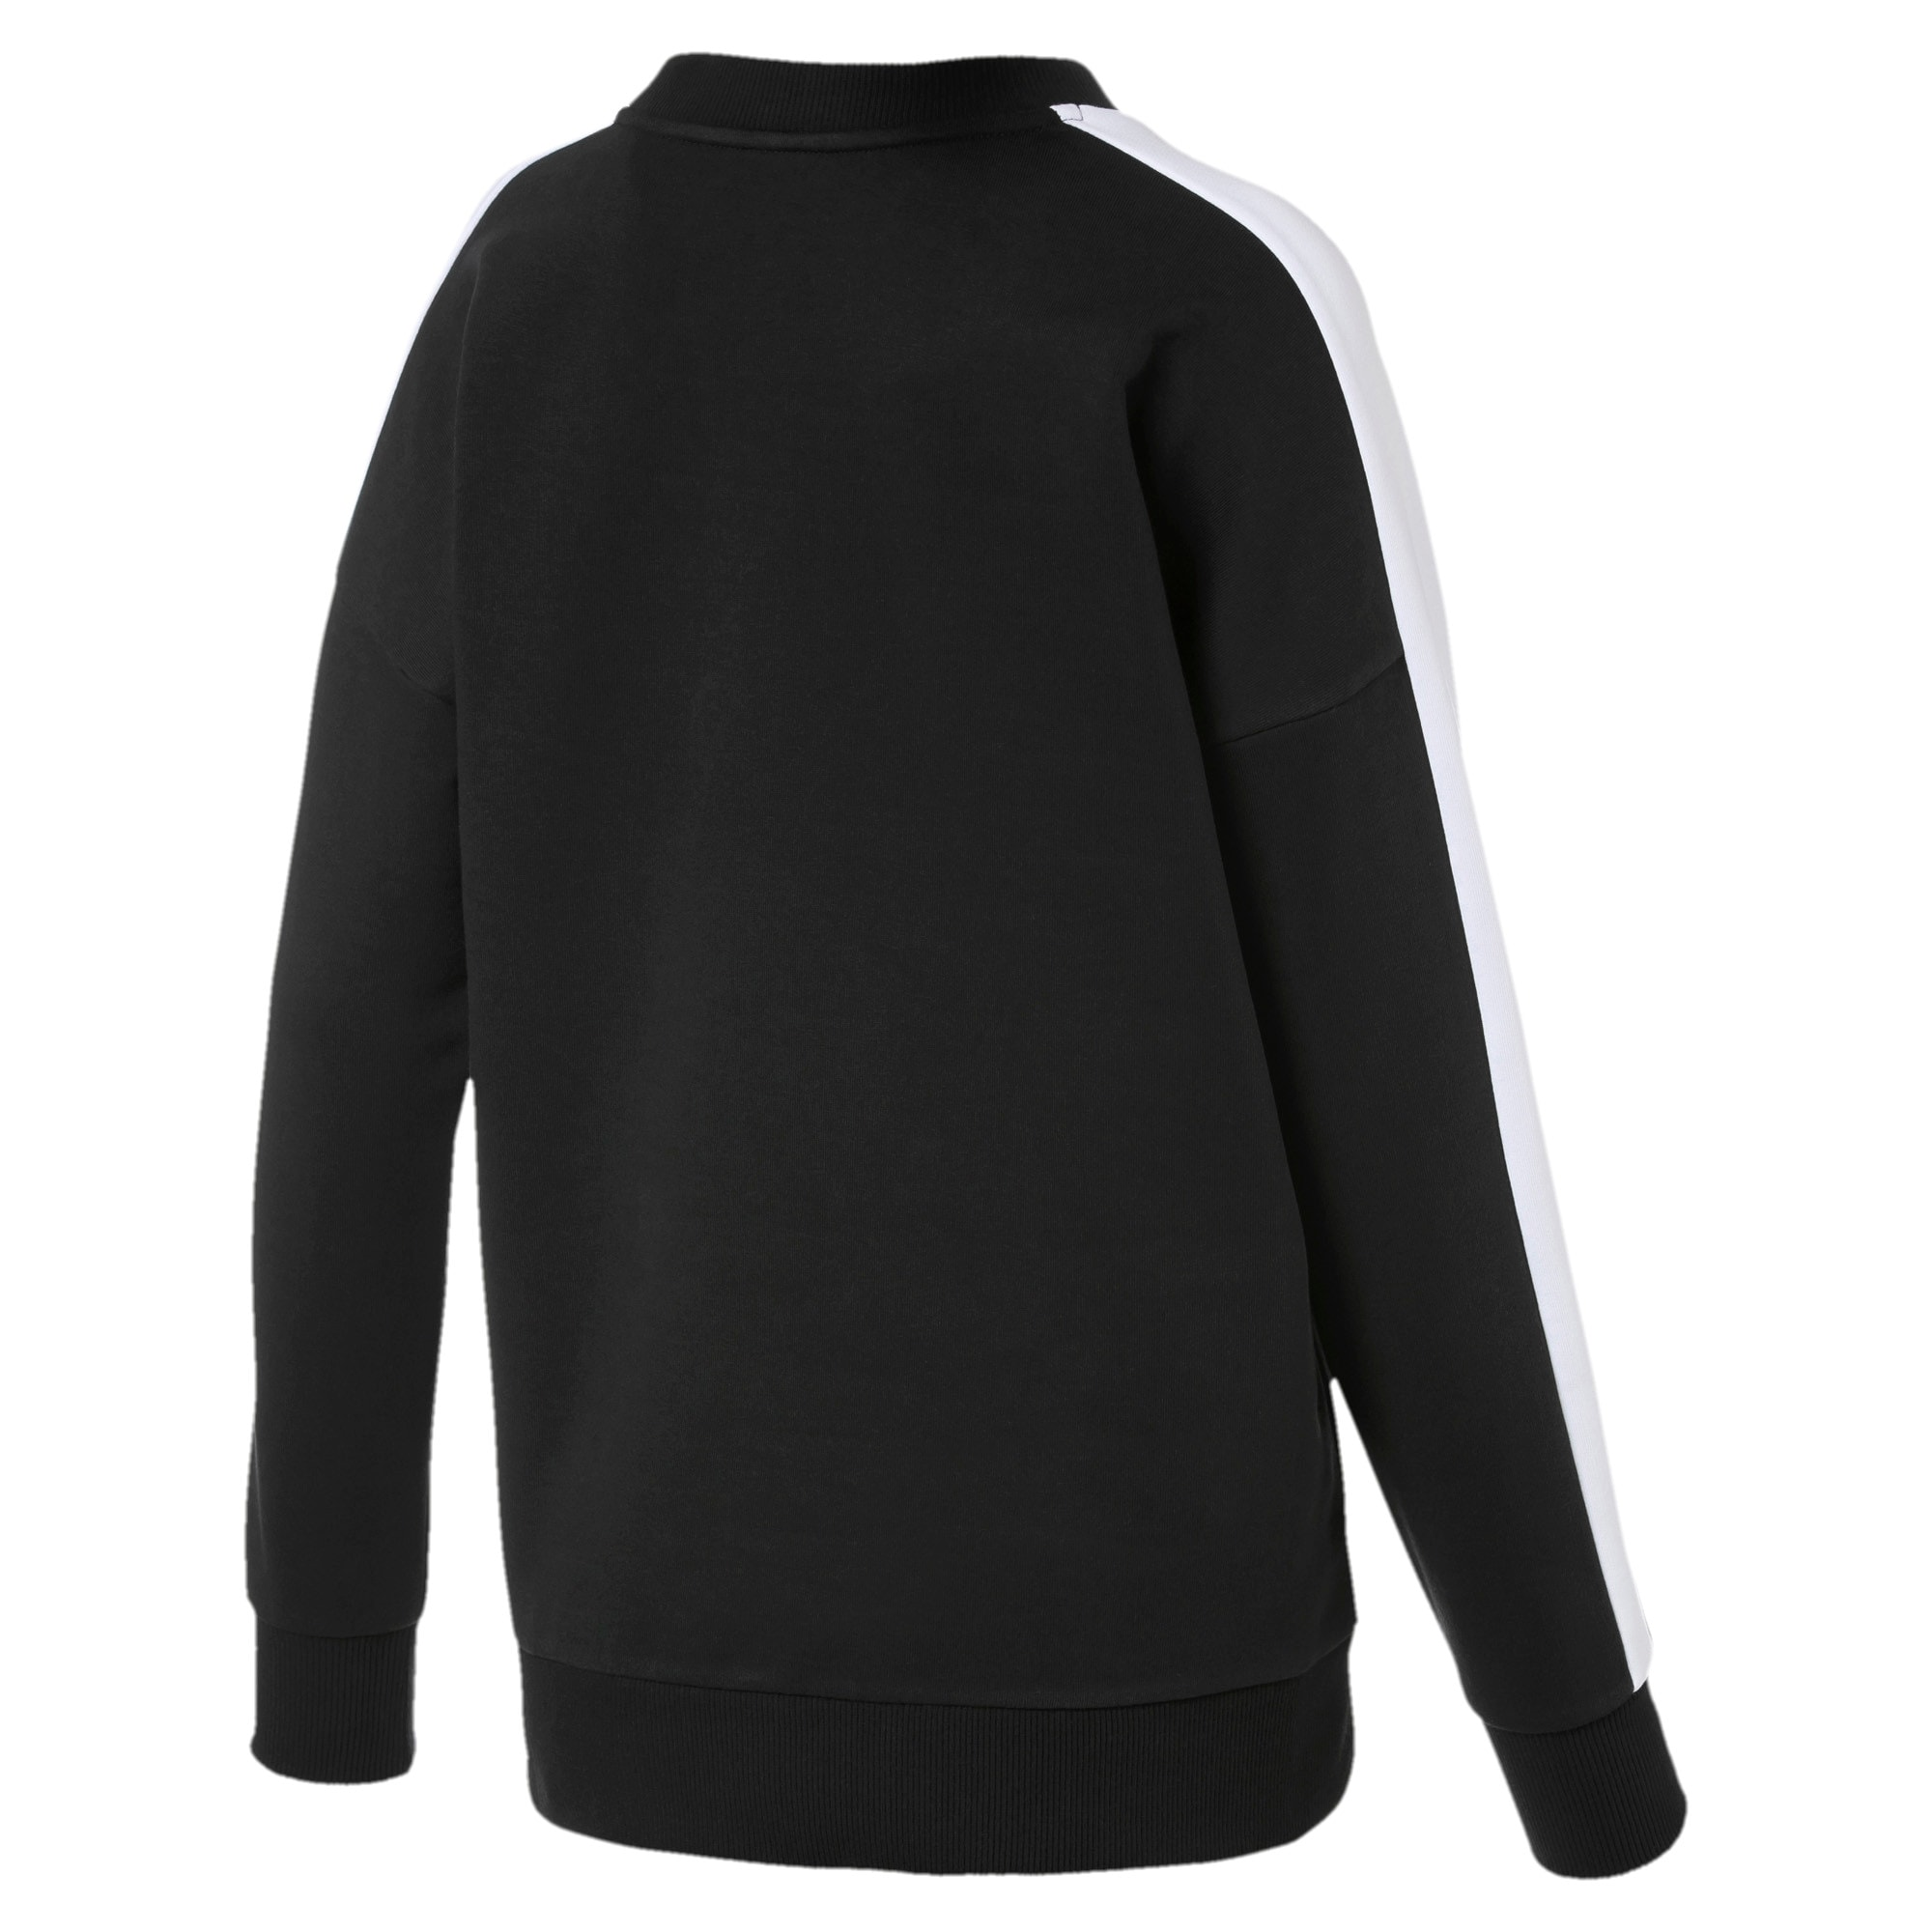 Thumbnail 5 of Classics T7 Women's Crewneck Sweatshirt, Puma Black, medium